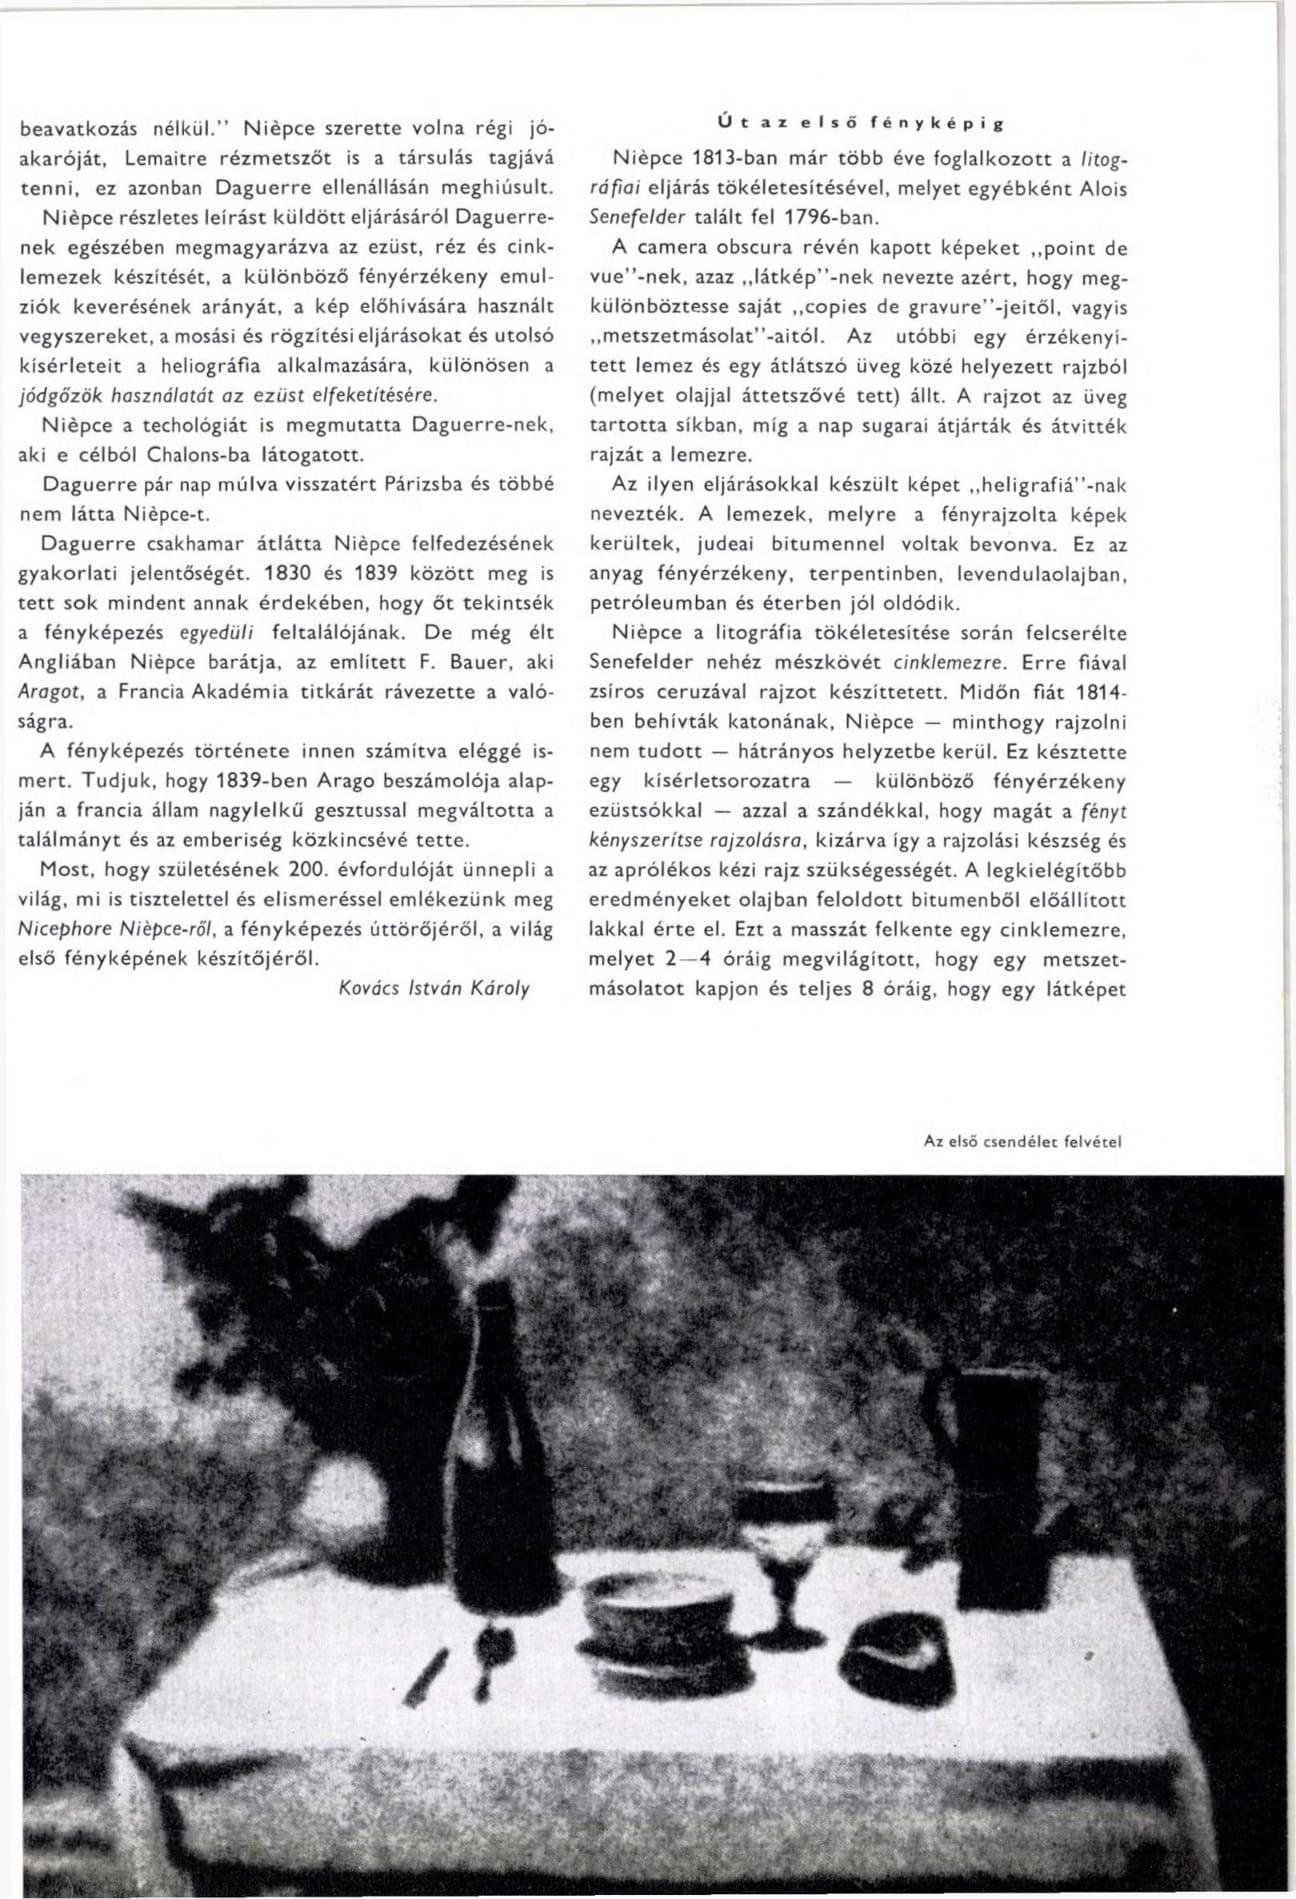 Foto, XIII. évfolyam, 1966. július<br />293. o.<br /><br />forrás: arcanum.hu